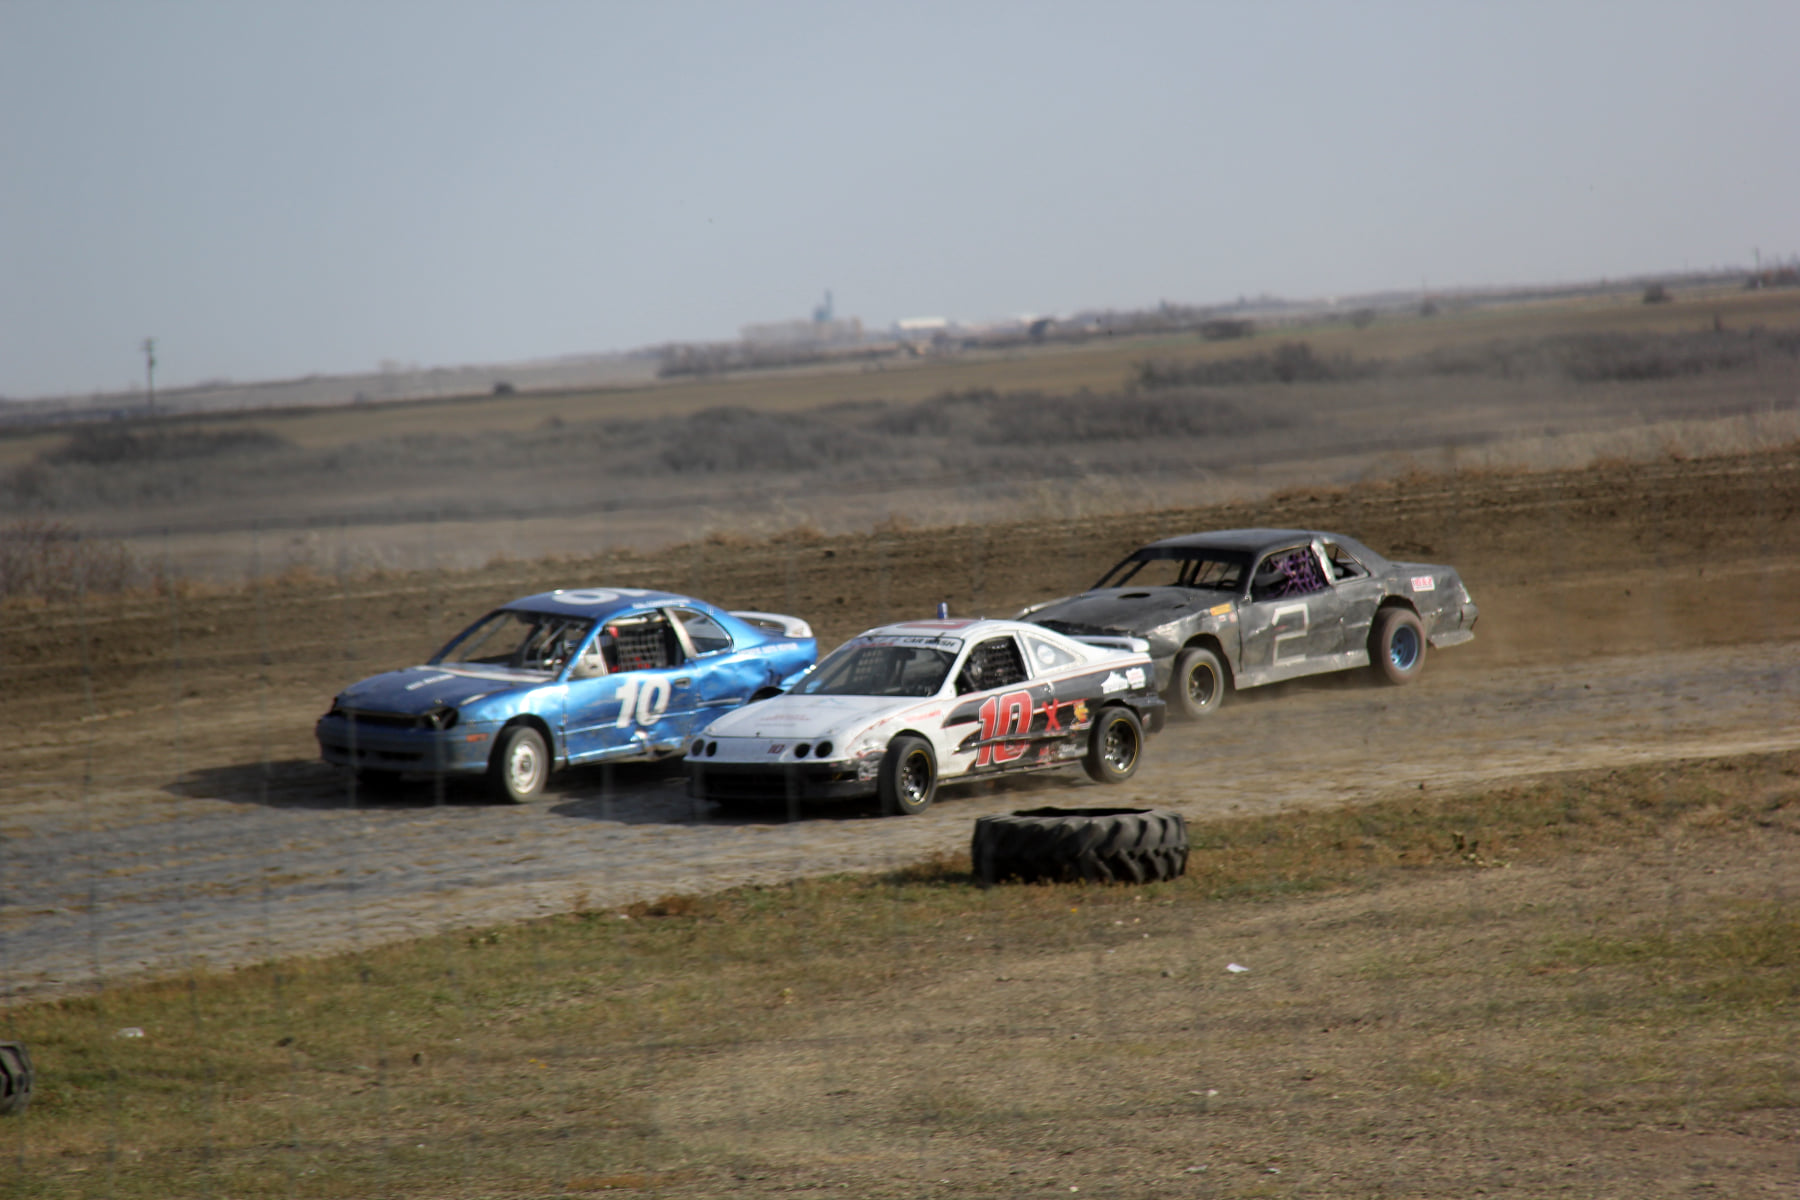 Outlook_Racing_Kemmer_Racing_Photography_17.jpg